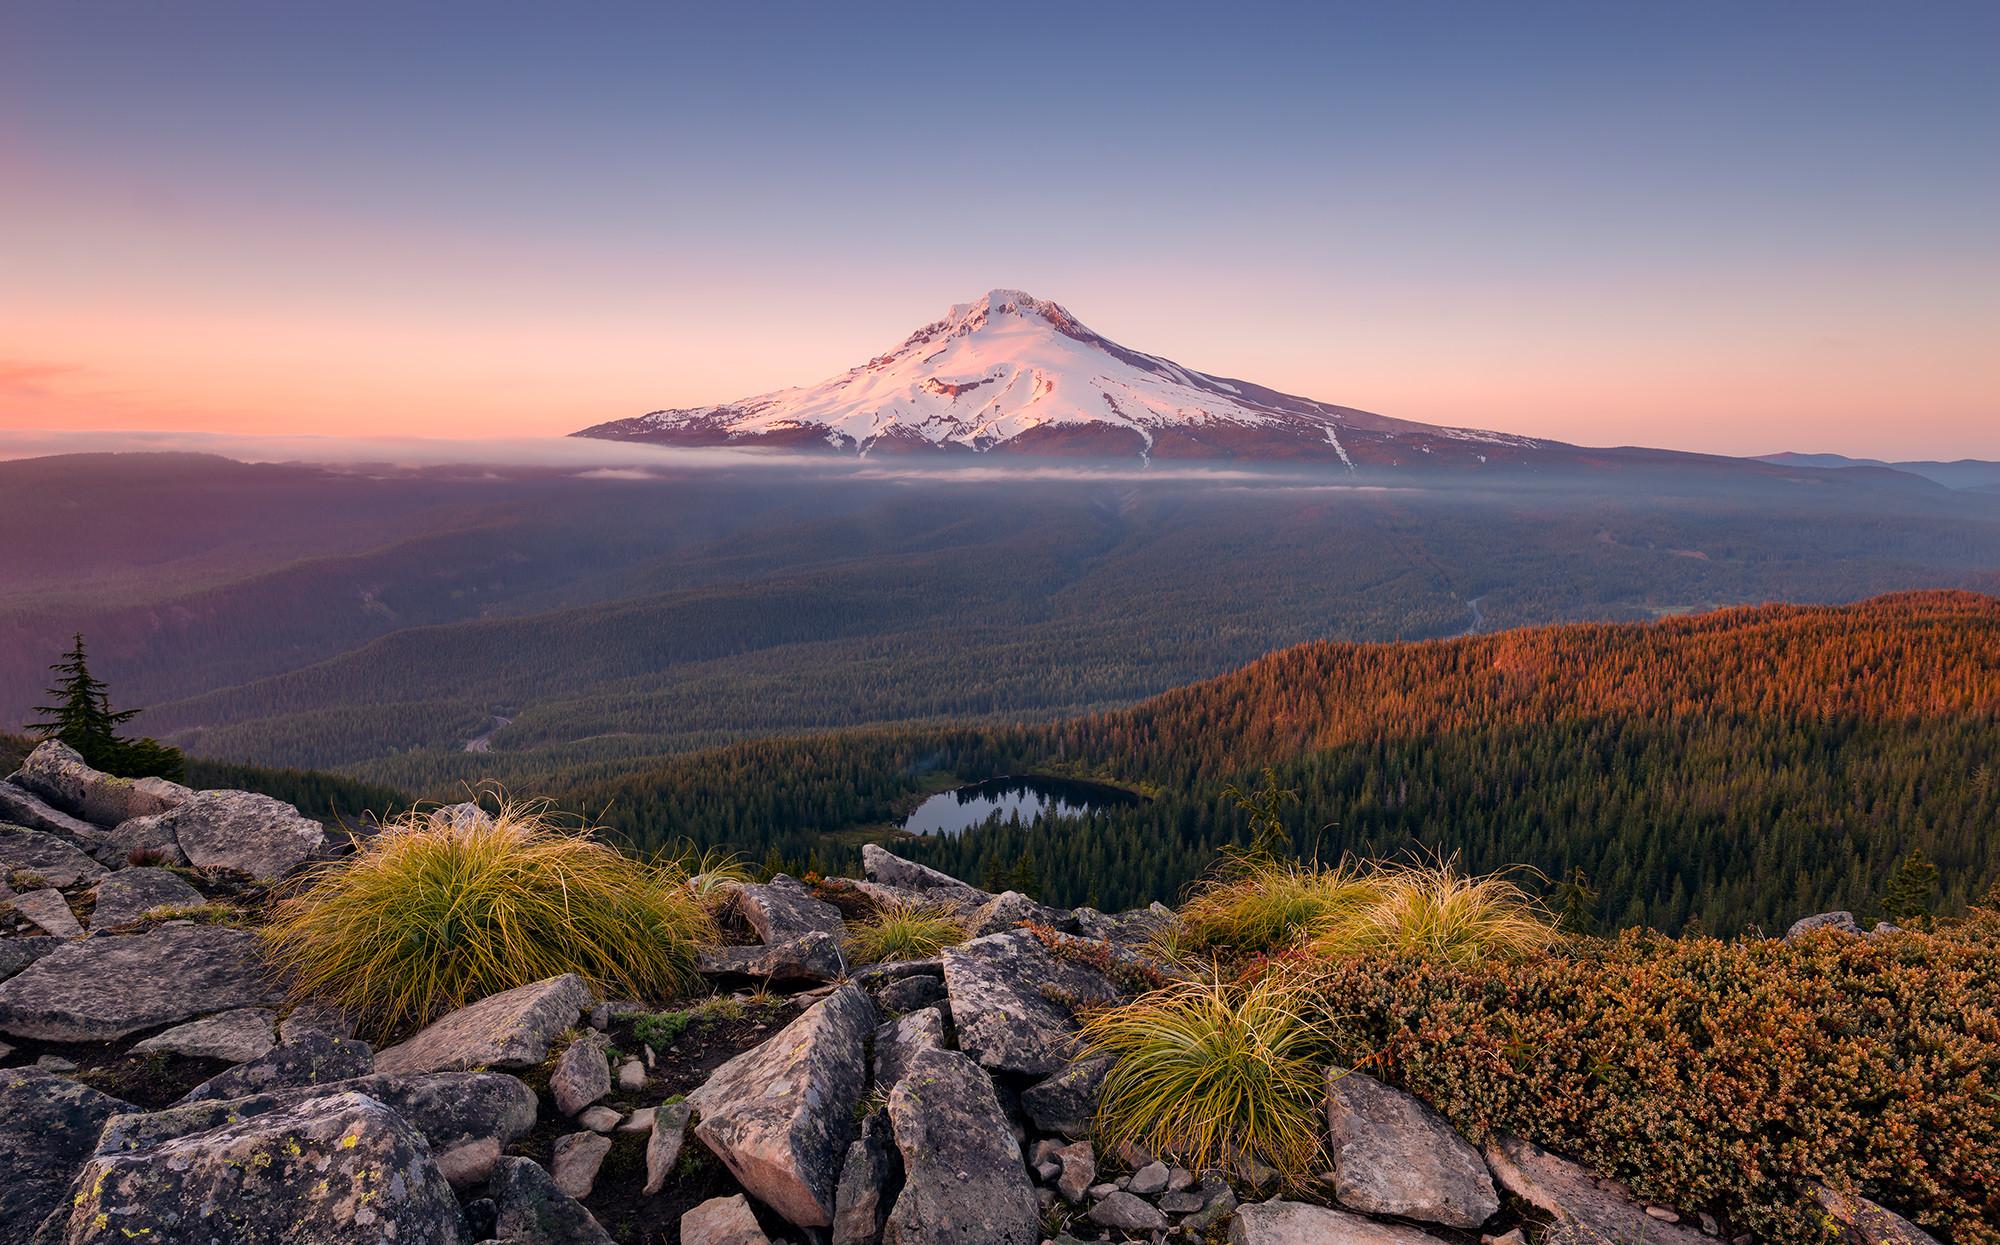 Kingdom of a Mountain